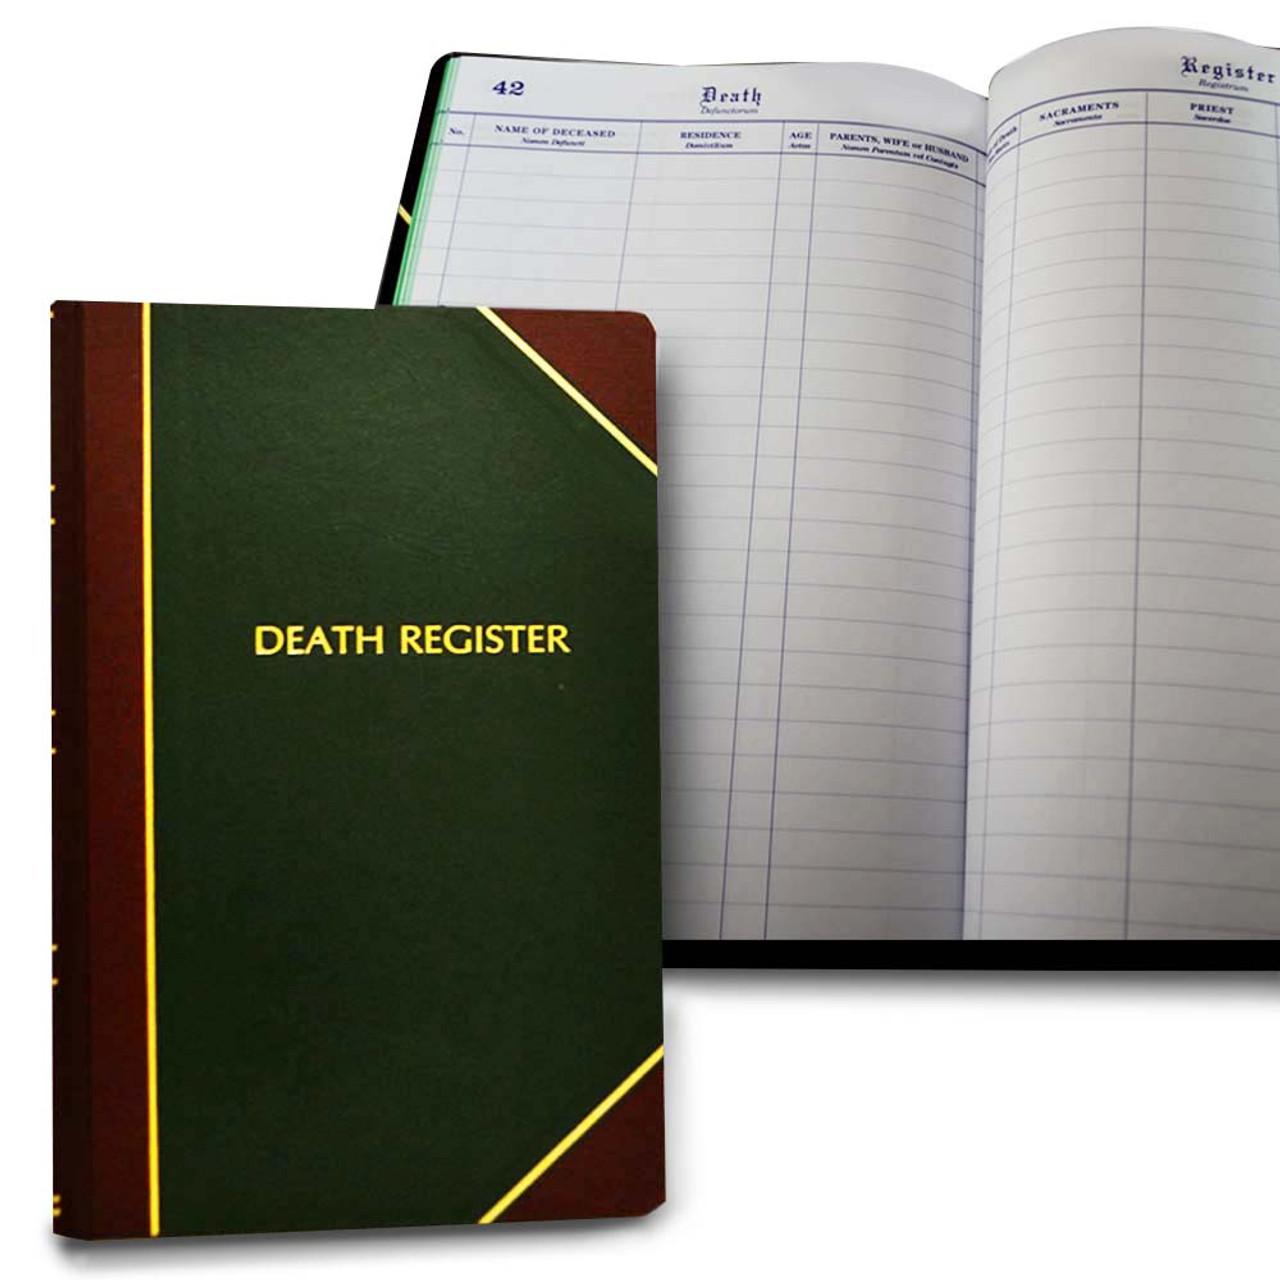 193 Death Register